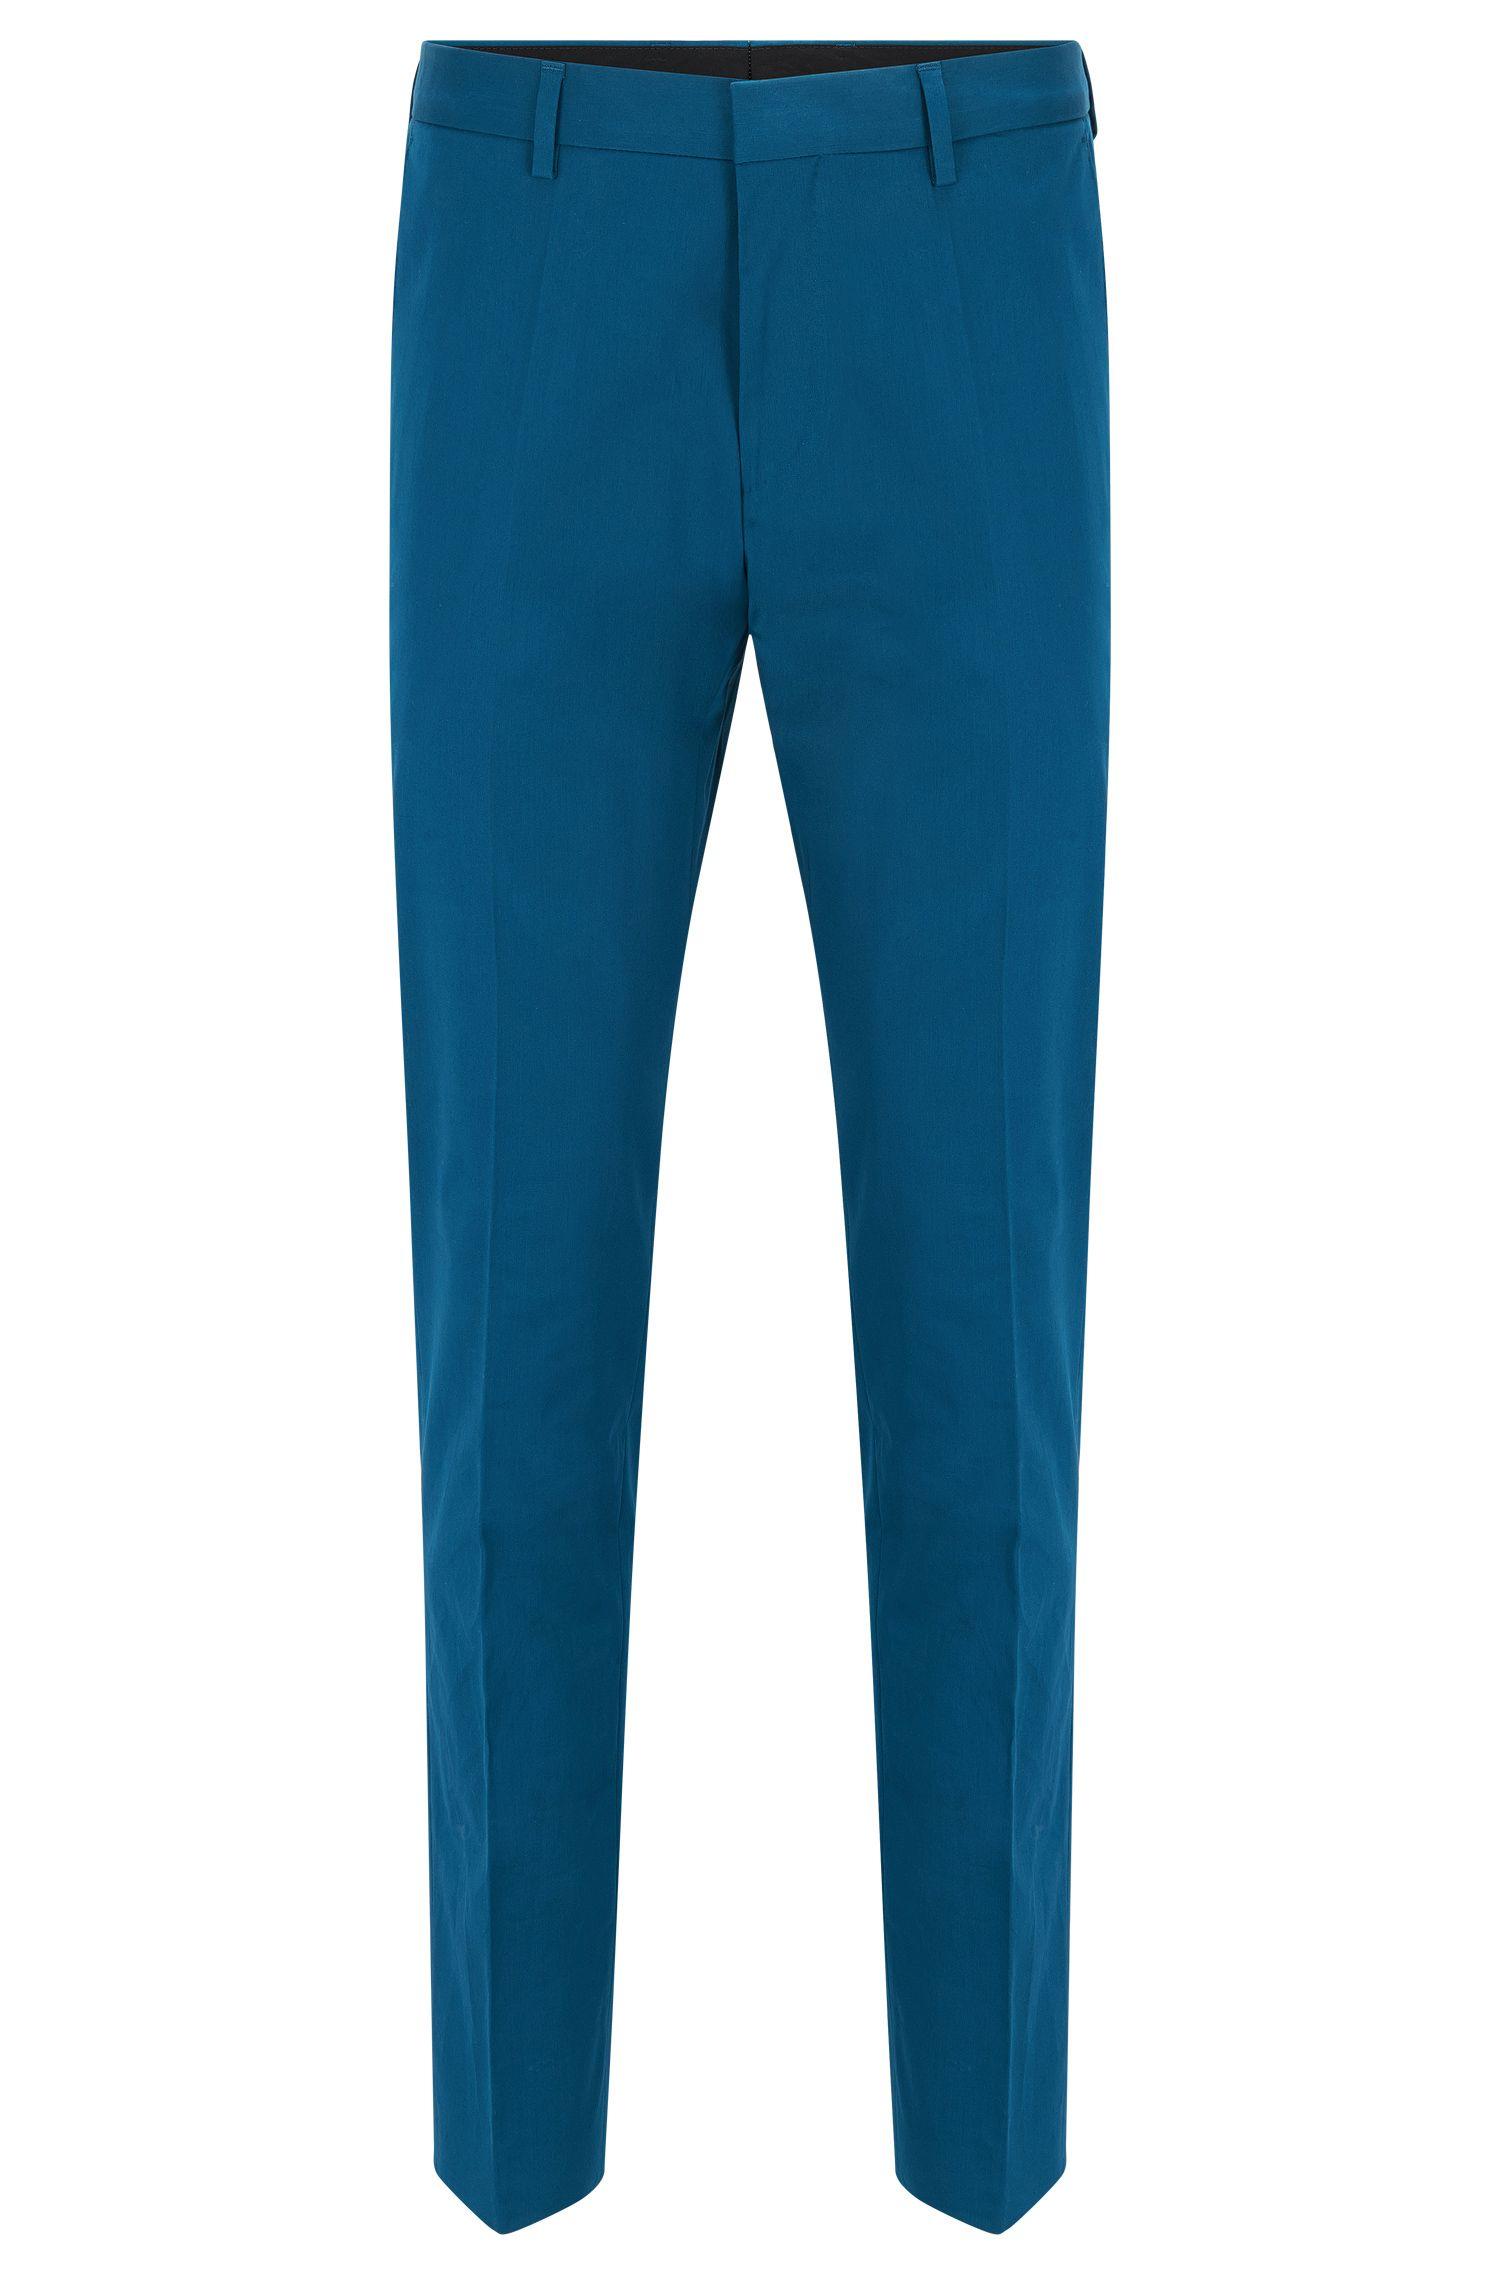 'Genesis' | Slim Fit, Stretch Cotton Dress Pants